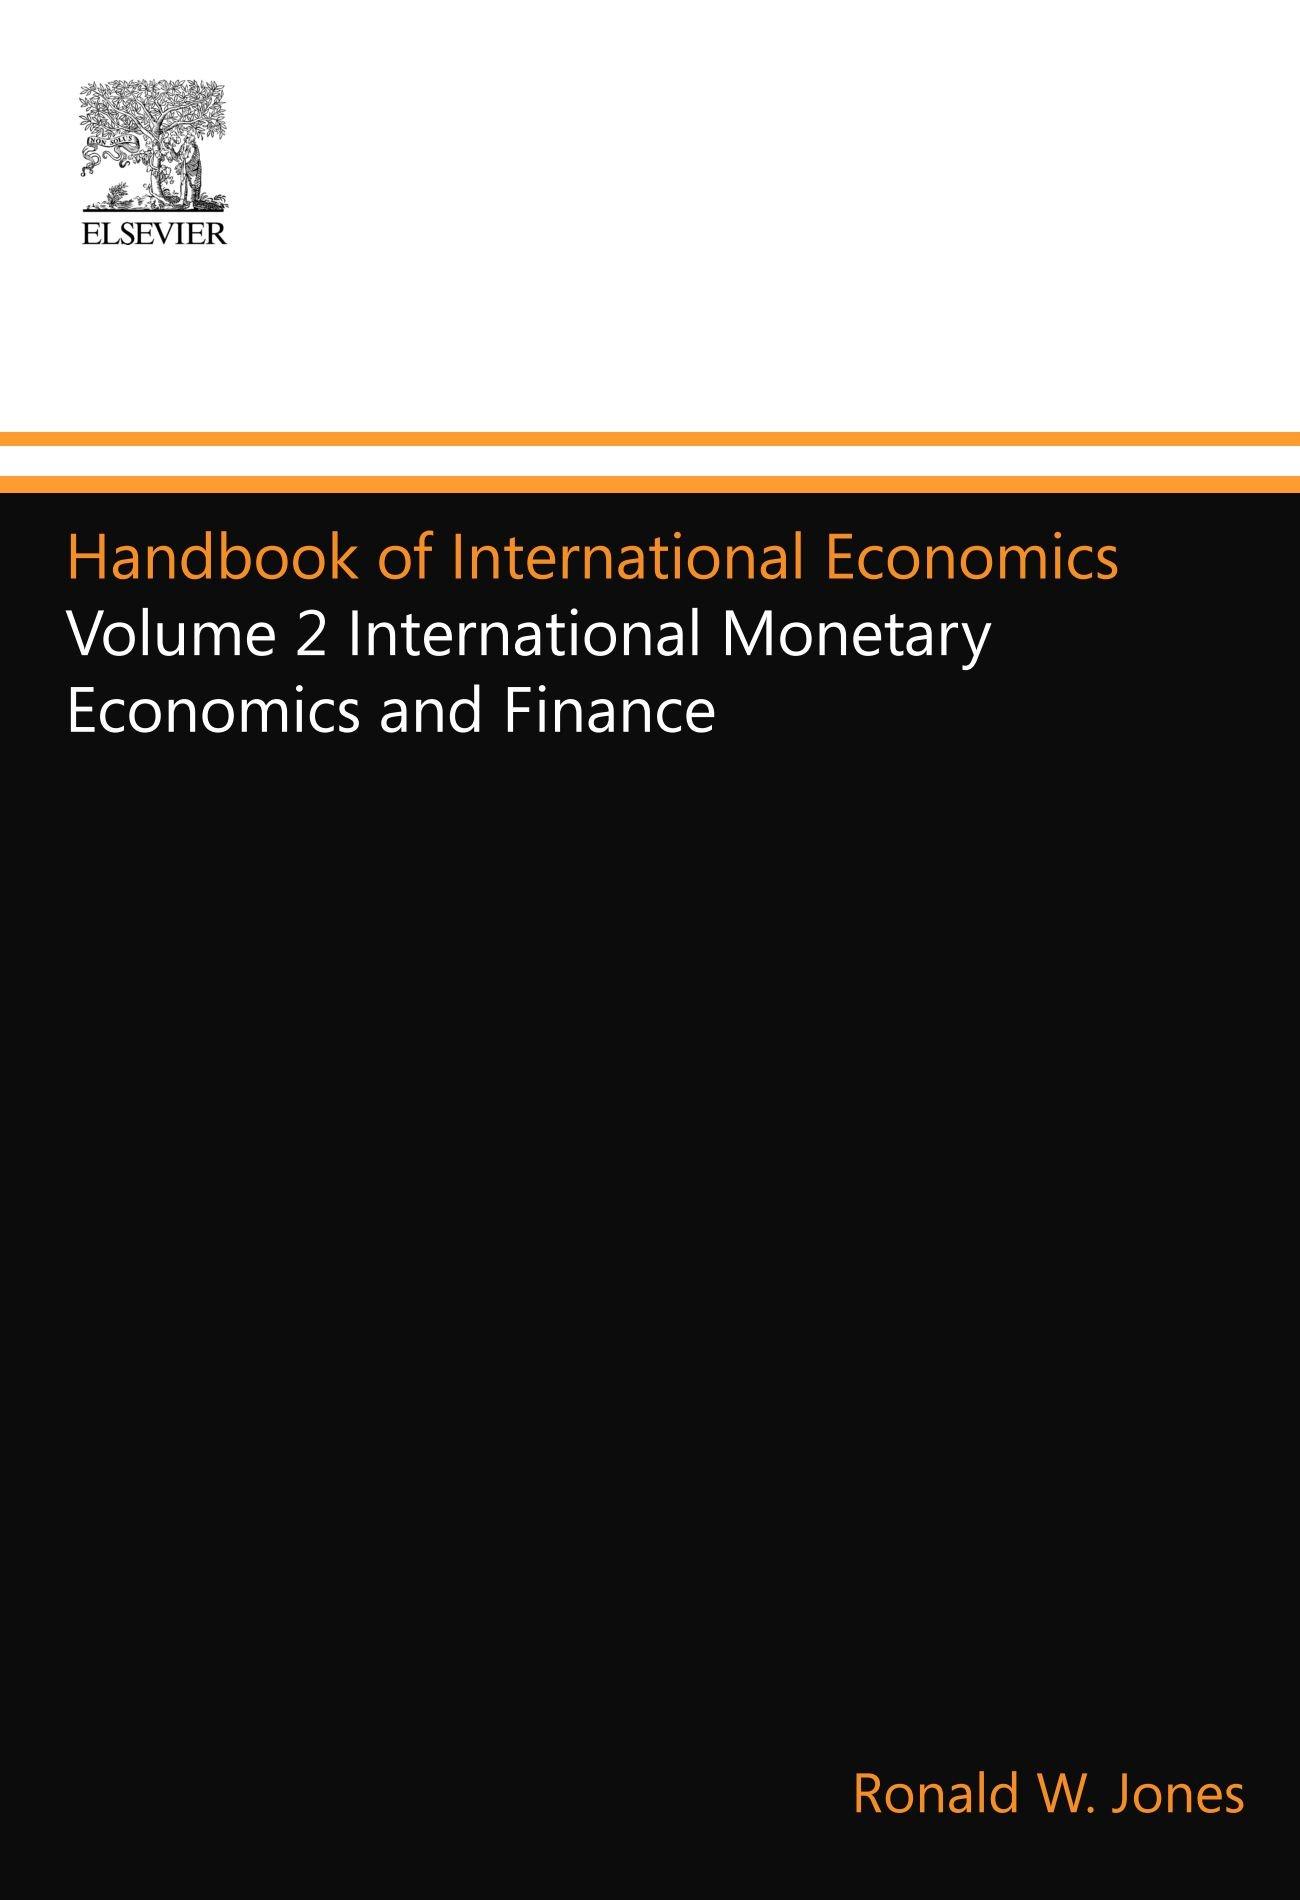 Handbook of International Economics: Volume 2 International Monetary  Economics and Finance (Handbooks in Economics): Amazon.co.uk: Ronald W.  Jones: ...